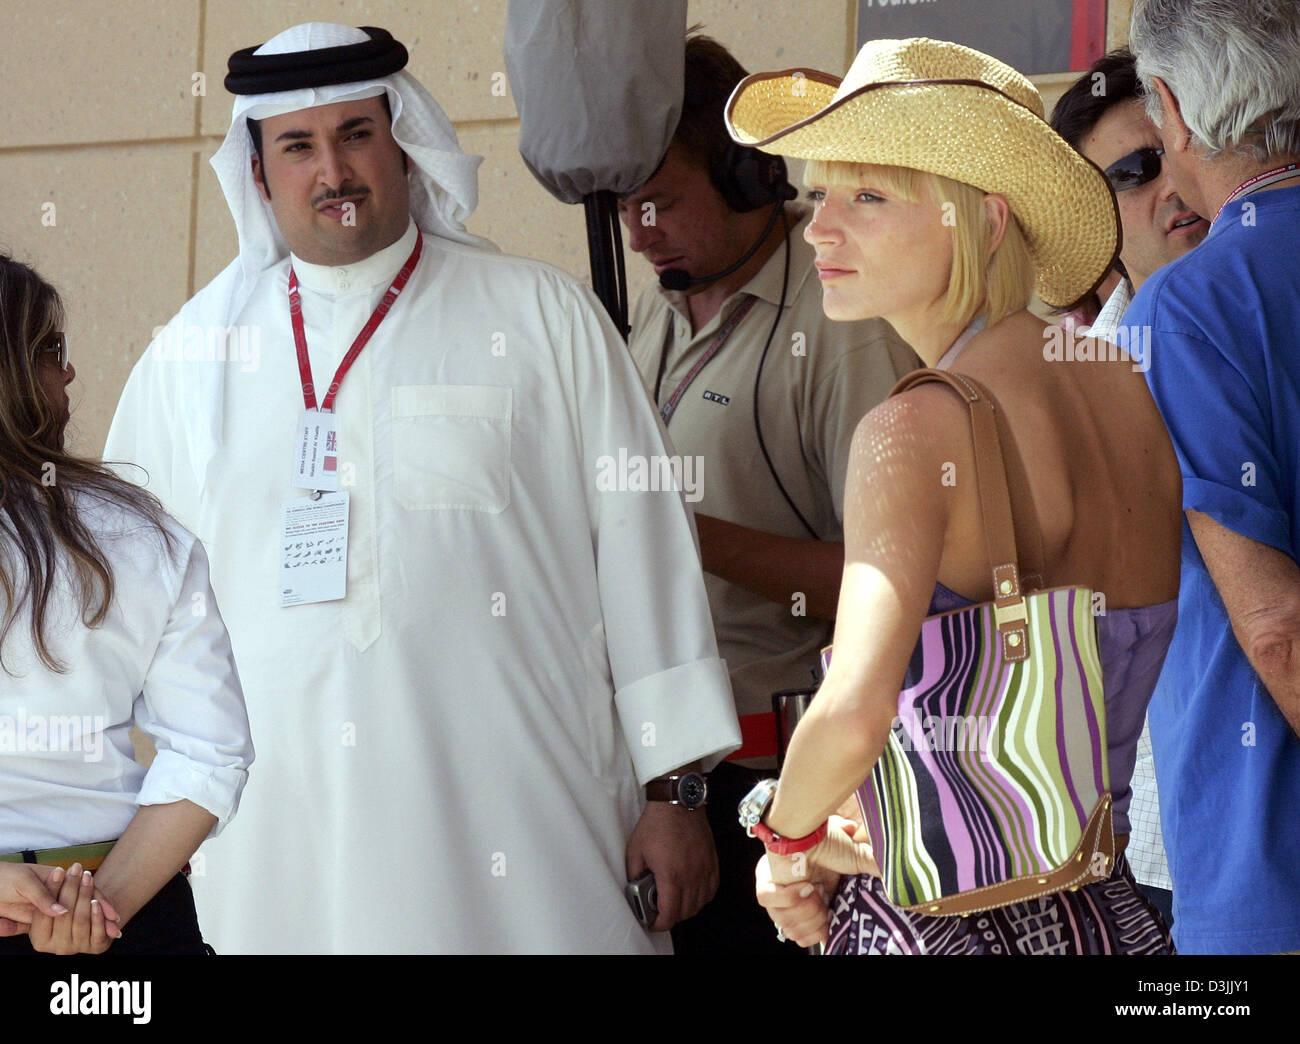 Sheik male or female